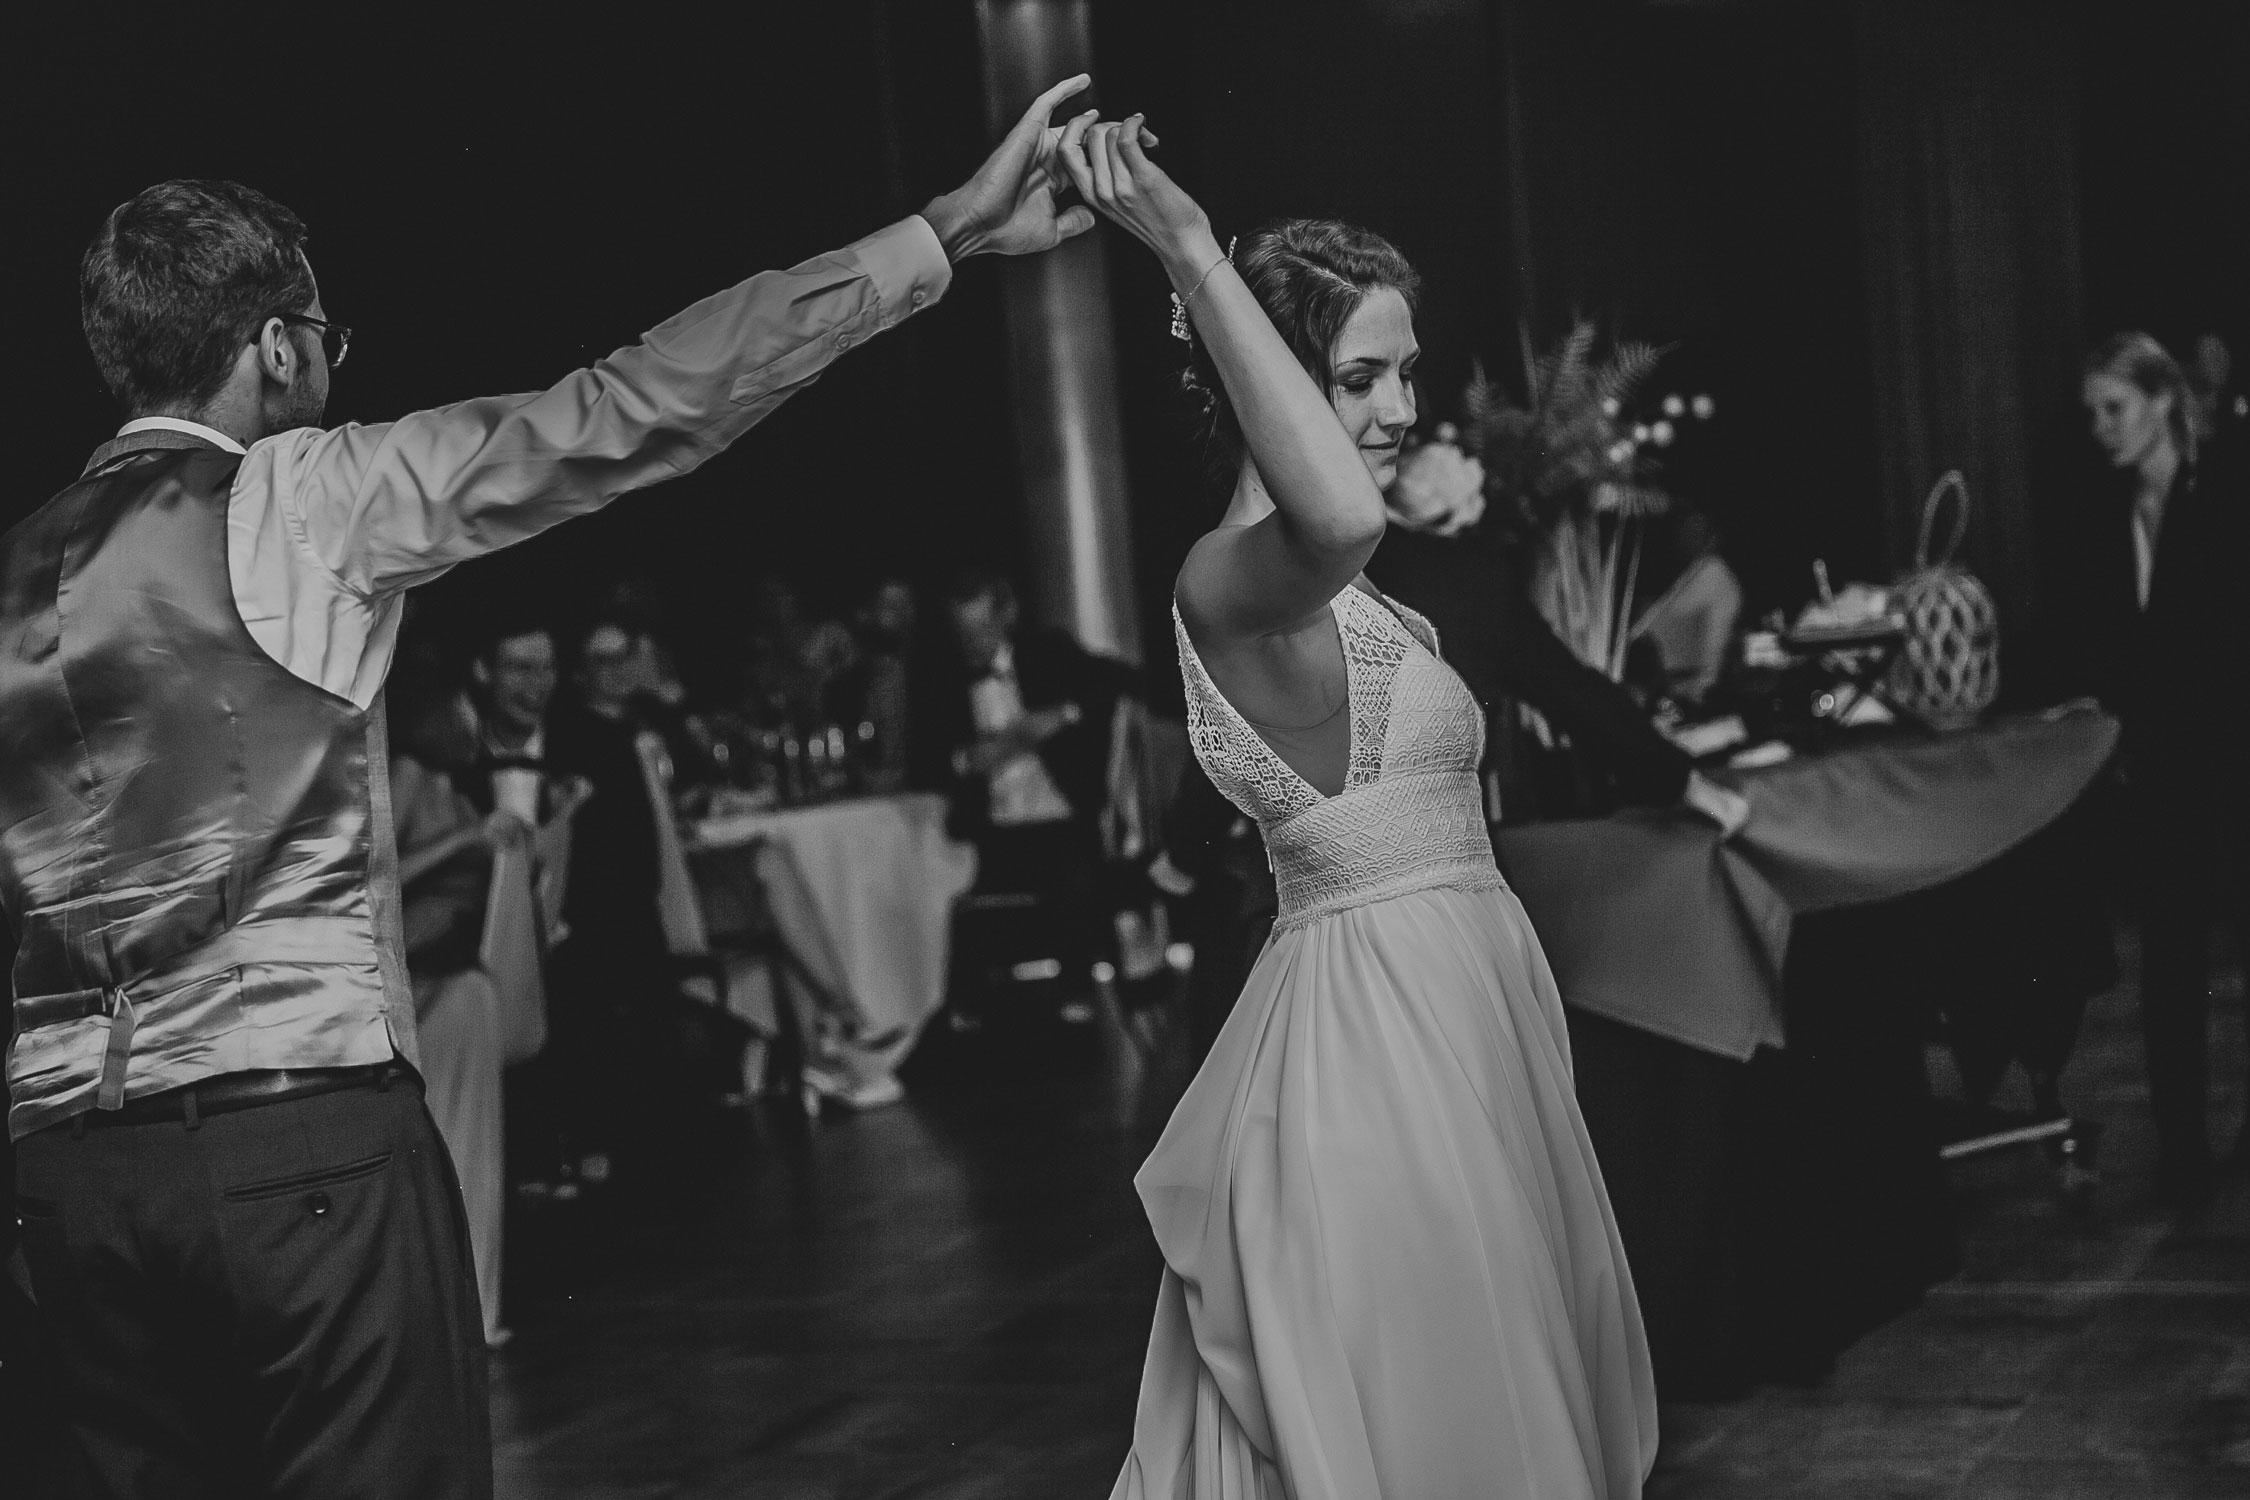 photographe-mariage-dancefloor-mariage-soiree